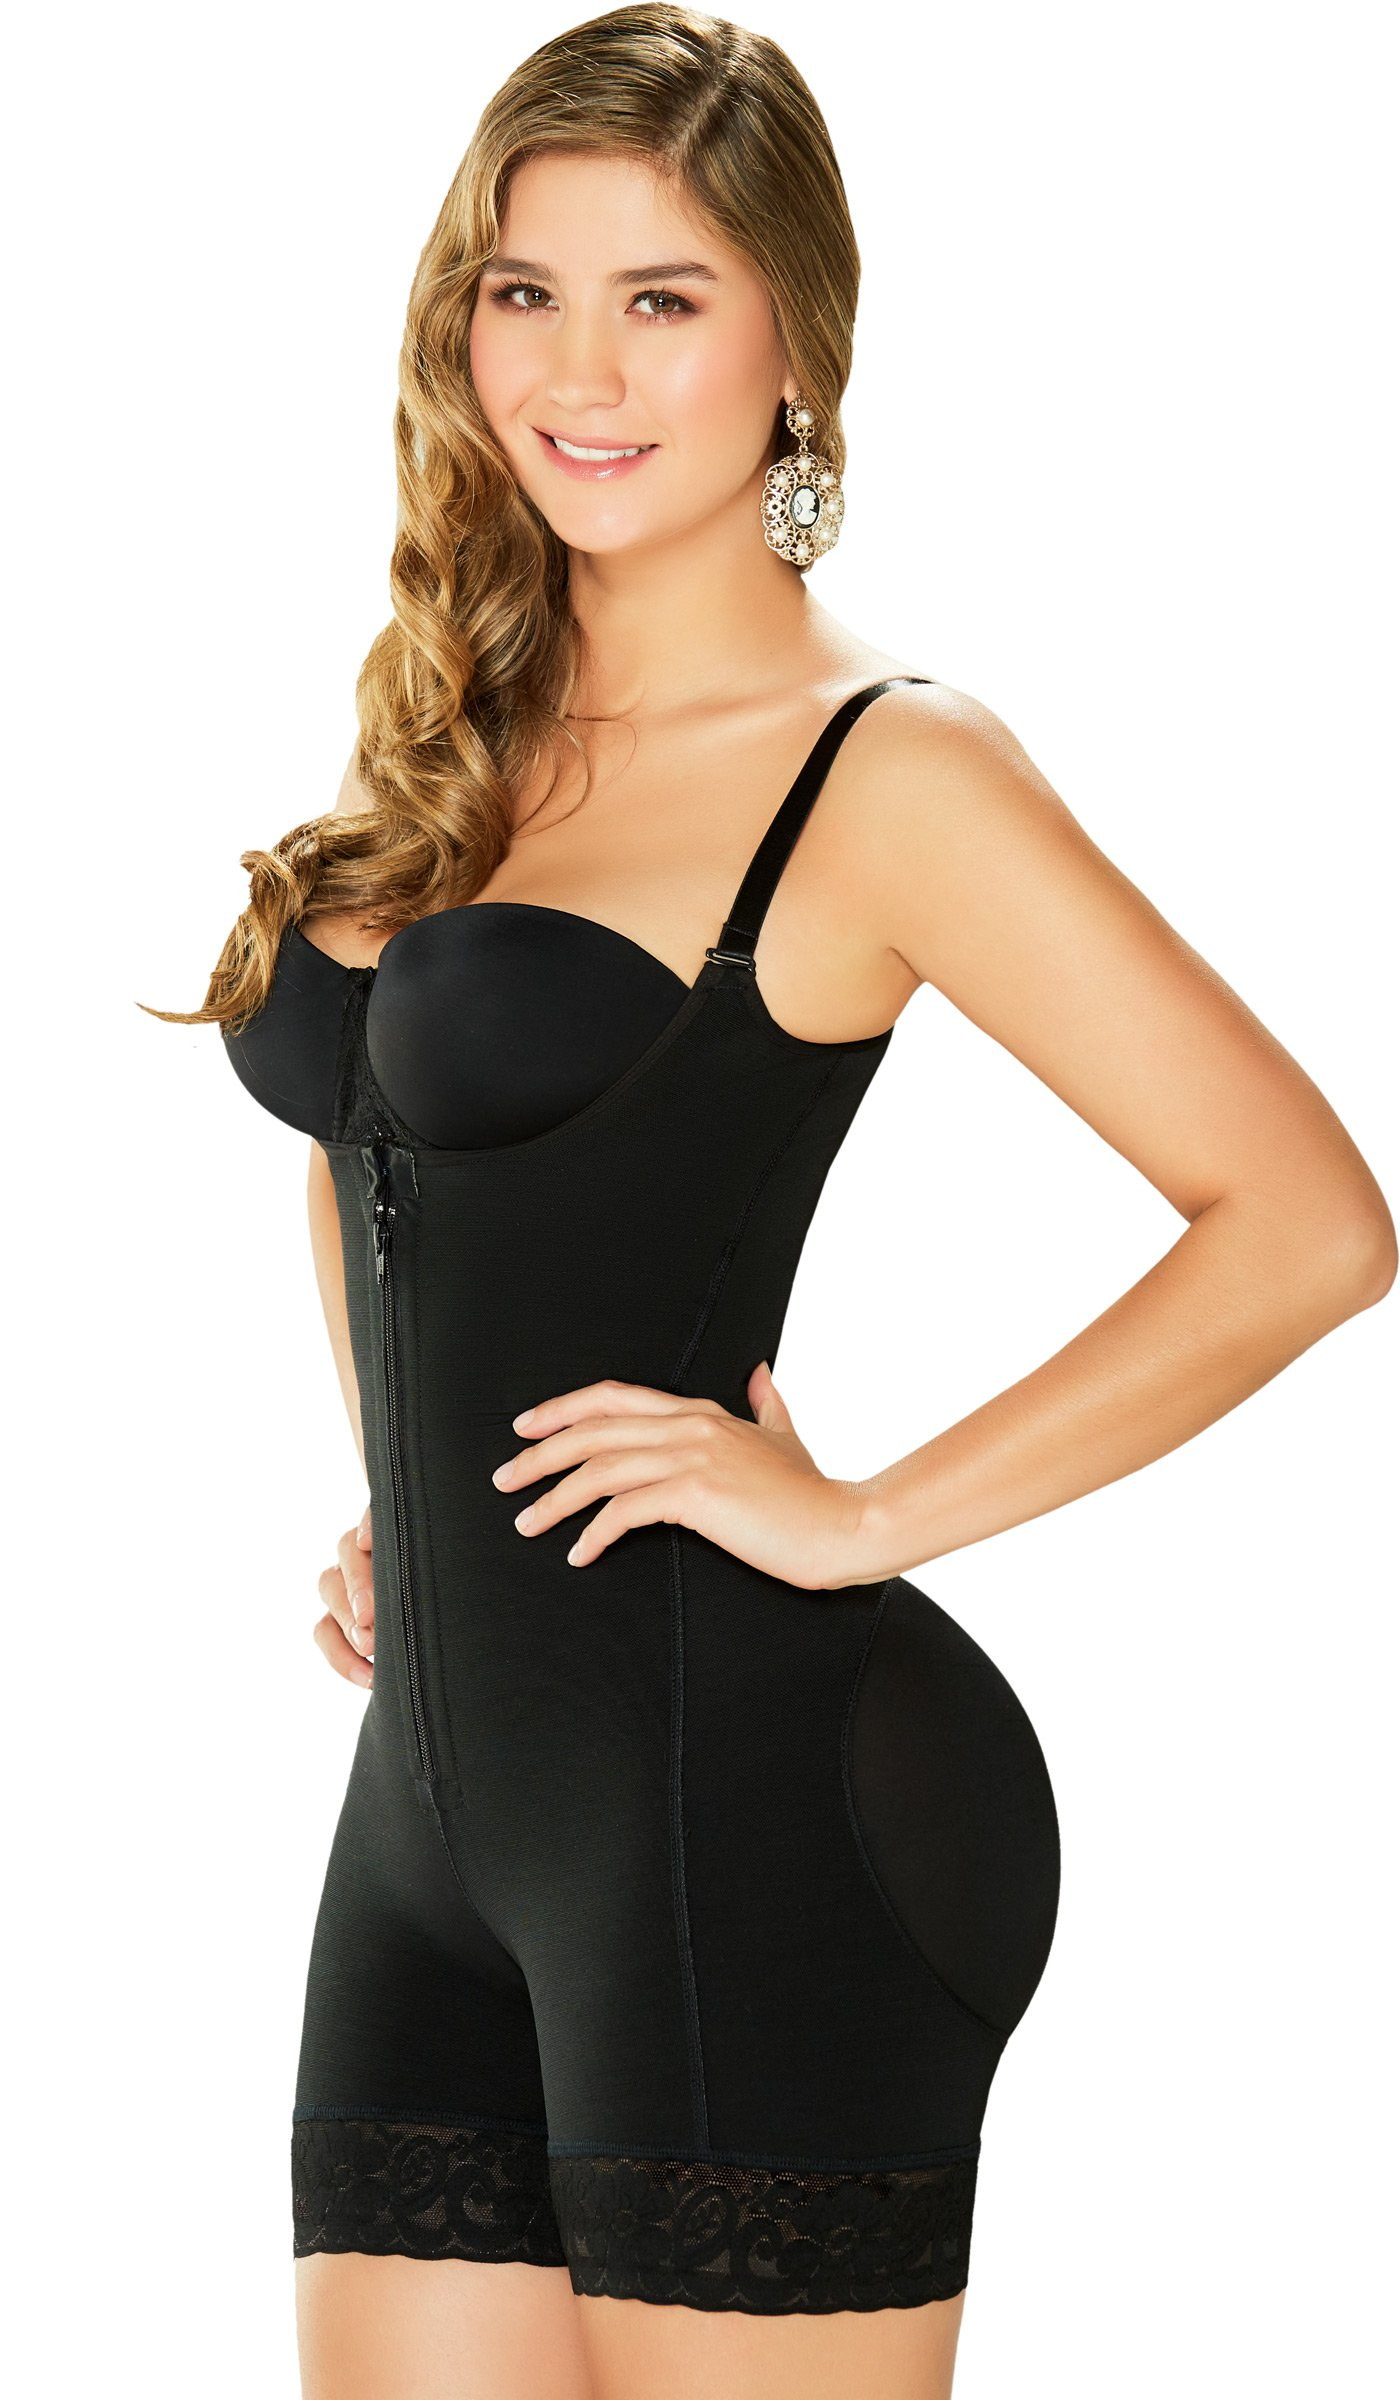 Fajas Colombianas Diane & Geordi 2396 Women's Post Partum Recovery Bodyshaper, Black, L/38 (Fits 36-39 Inch Waist)